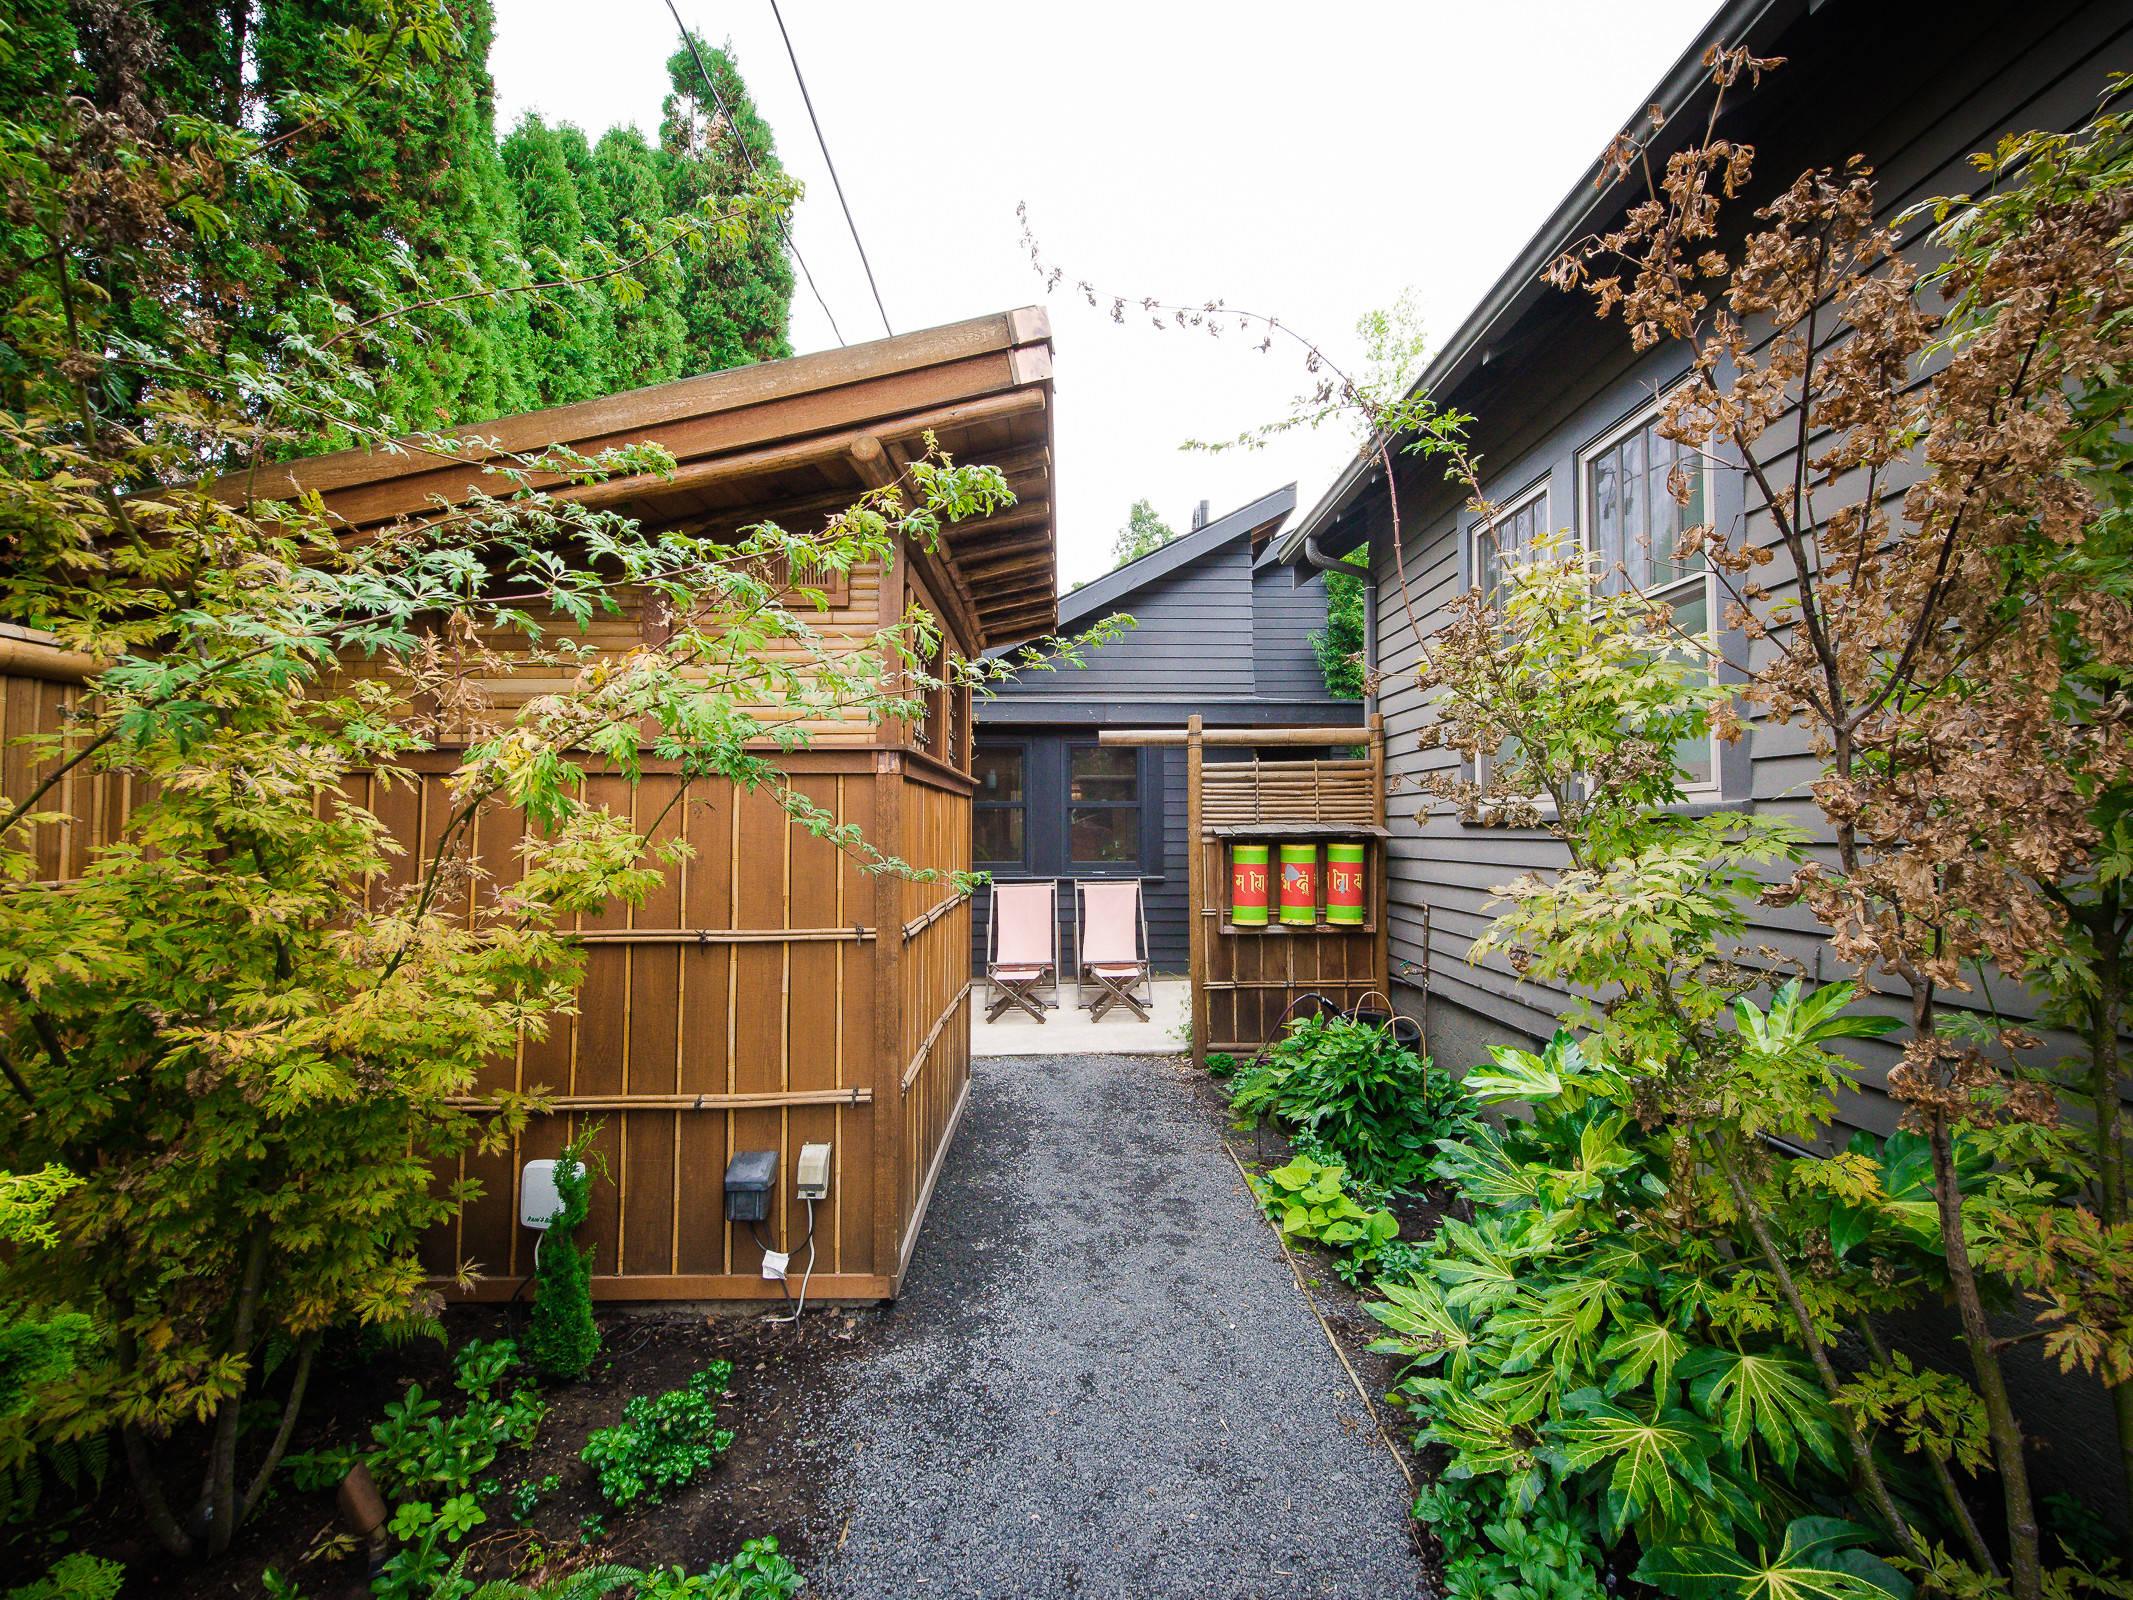 Japanese Modern Adu Tiny House For A Designer Asian Landscape Portland By Sbaird Design Houzz